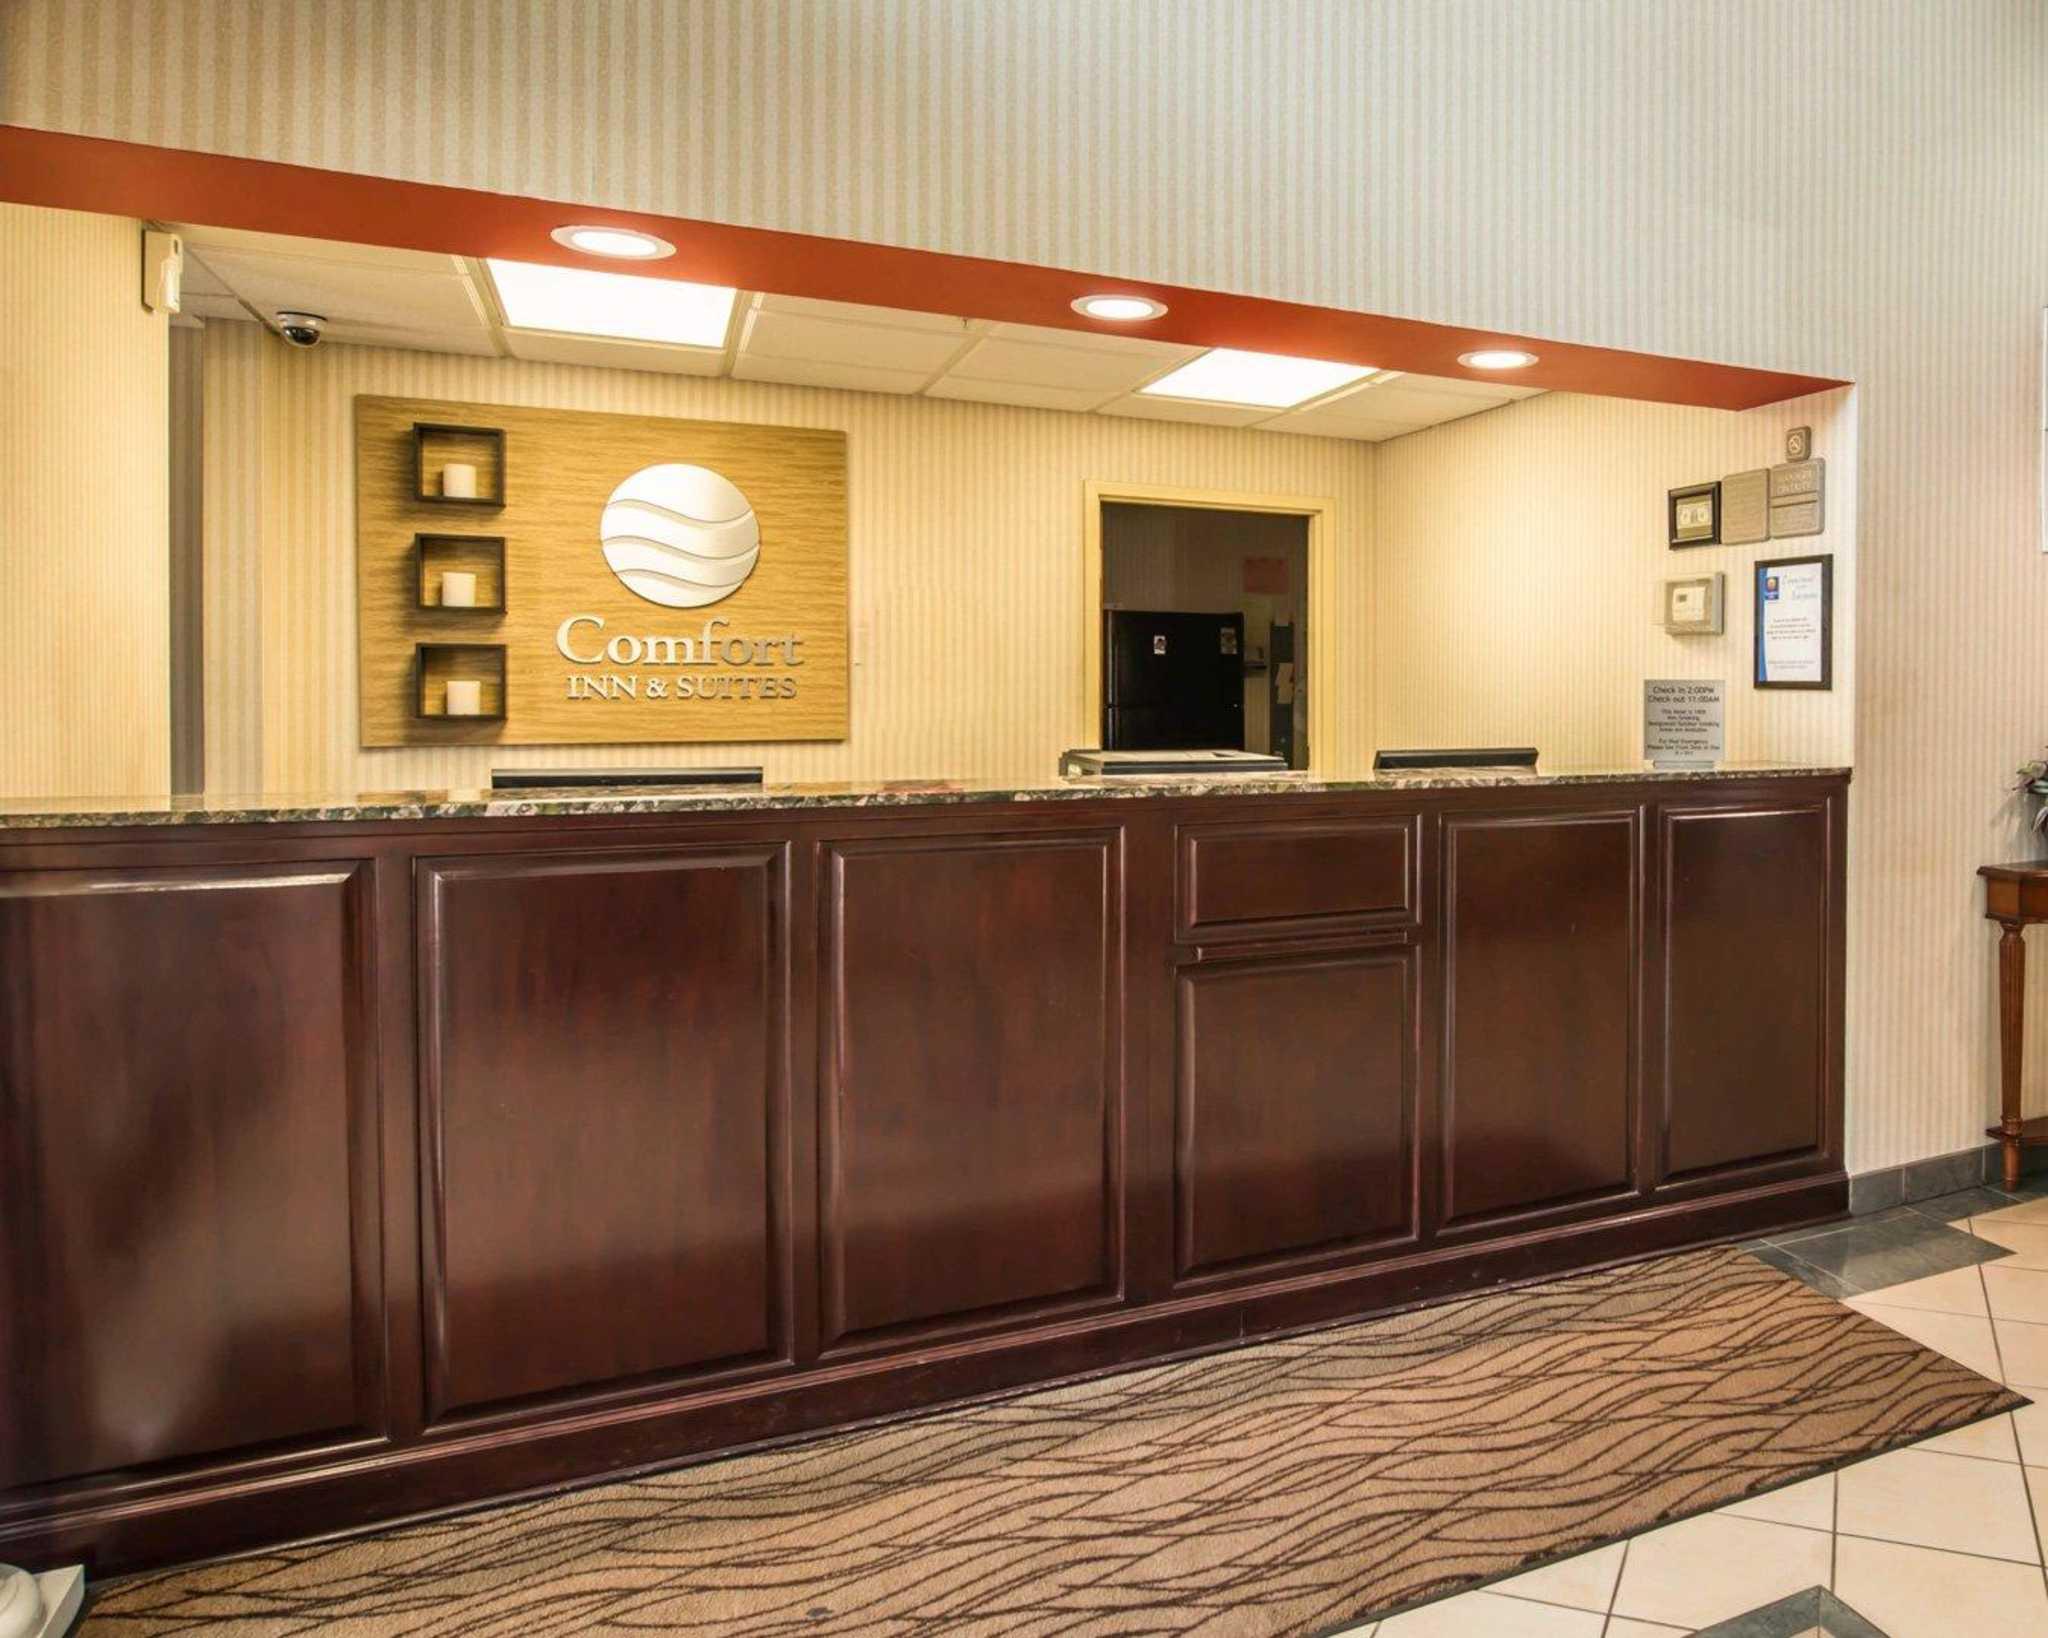 Comfort Inn Amp Suites Coupons Morganton Nc Near Me 8coupons